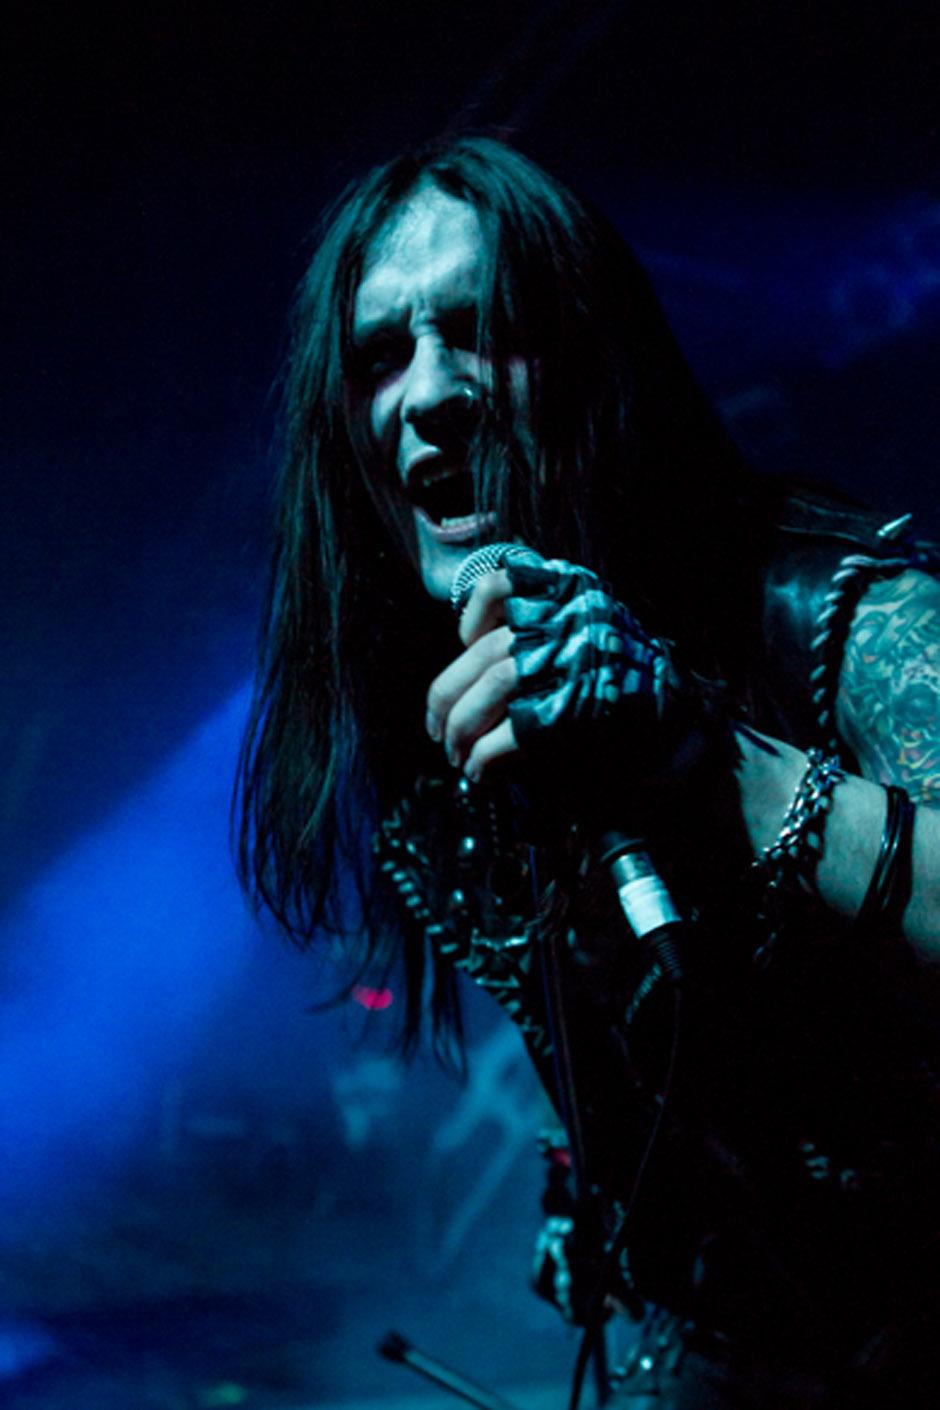 The Fright live, 27.01.2013, Hamburg